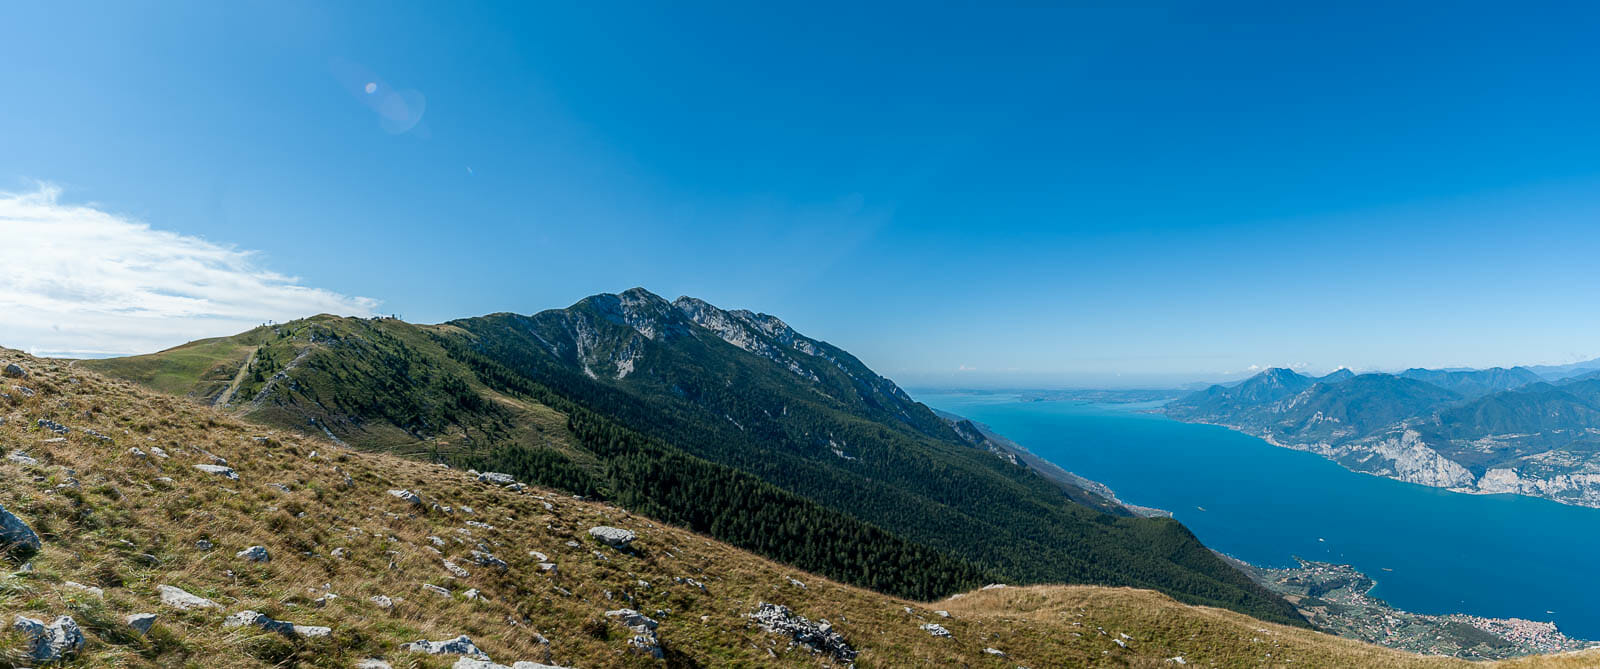 lake view from monte baldo